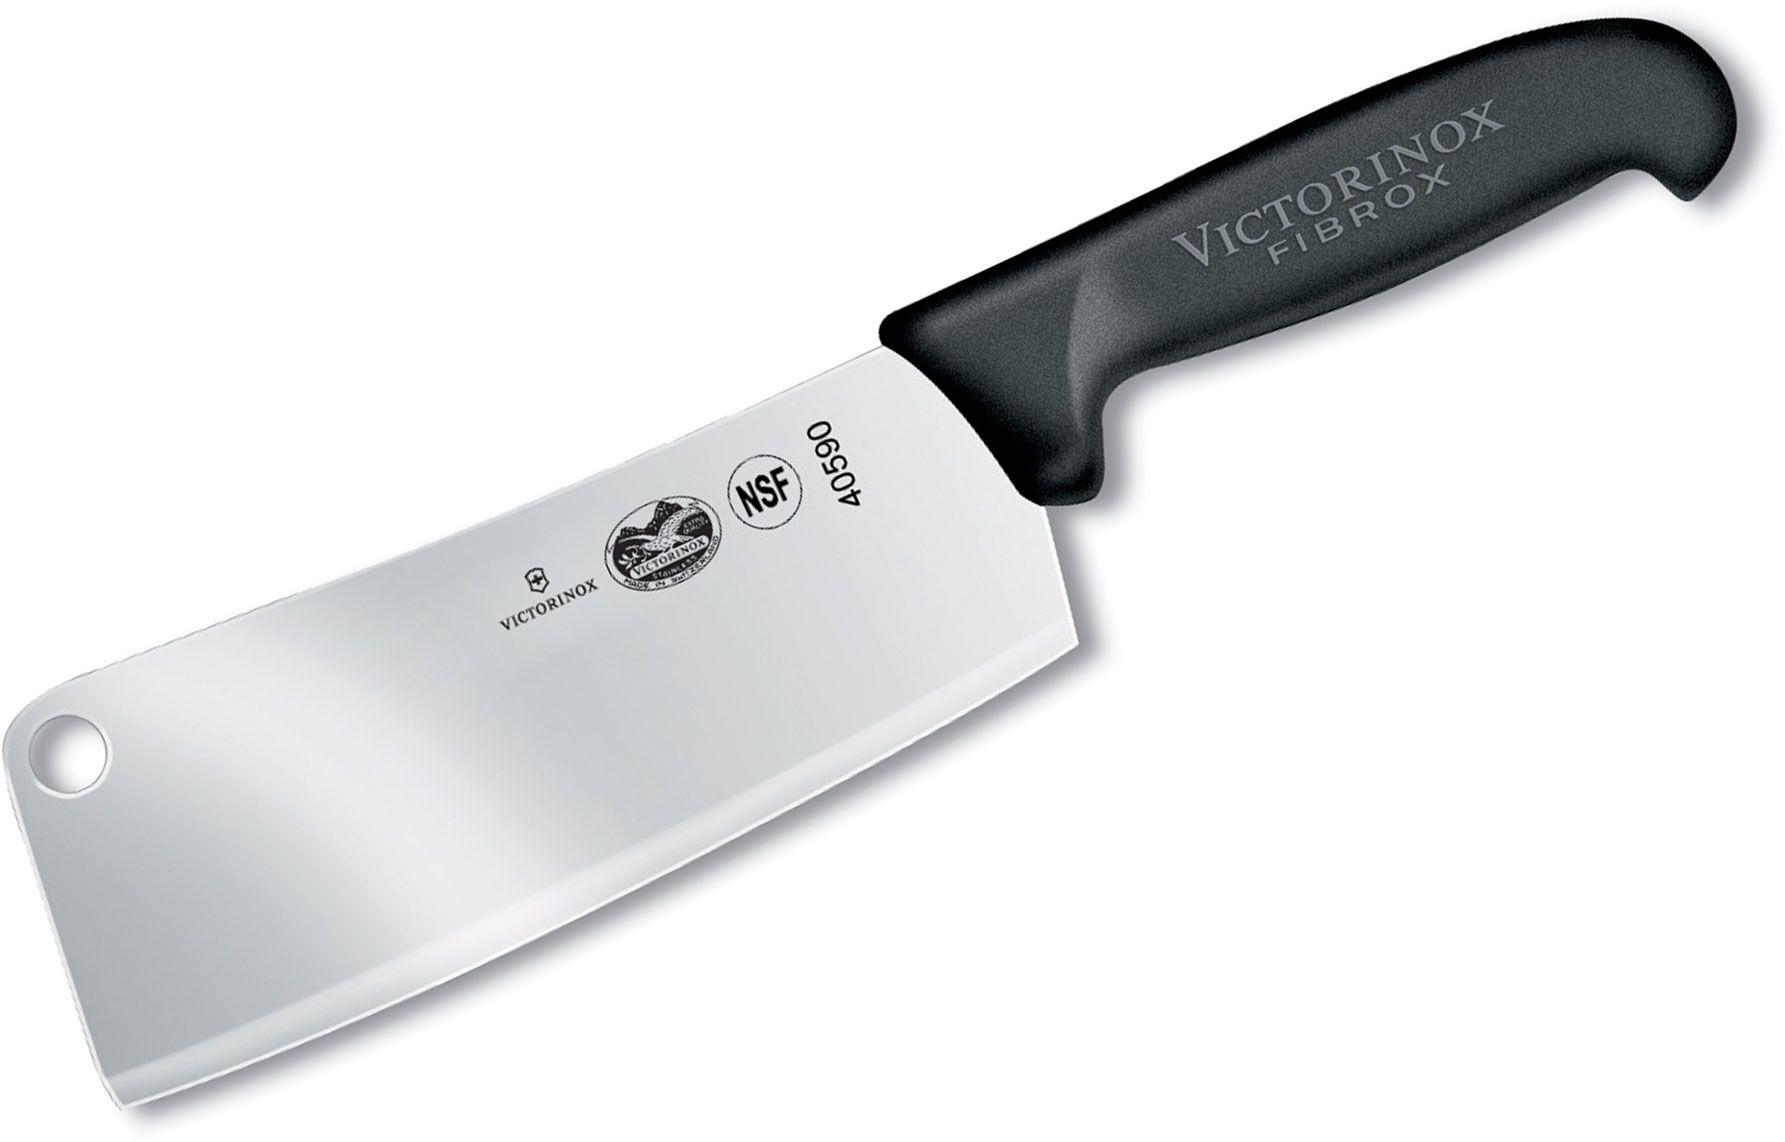 Victorinox Forschner Fibrox 7 inch Cleaver, Black TPE Handle